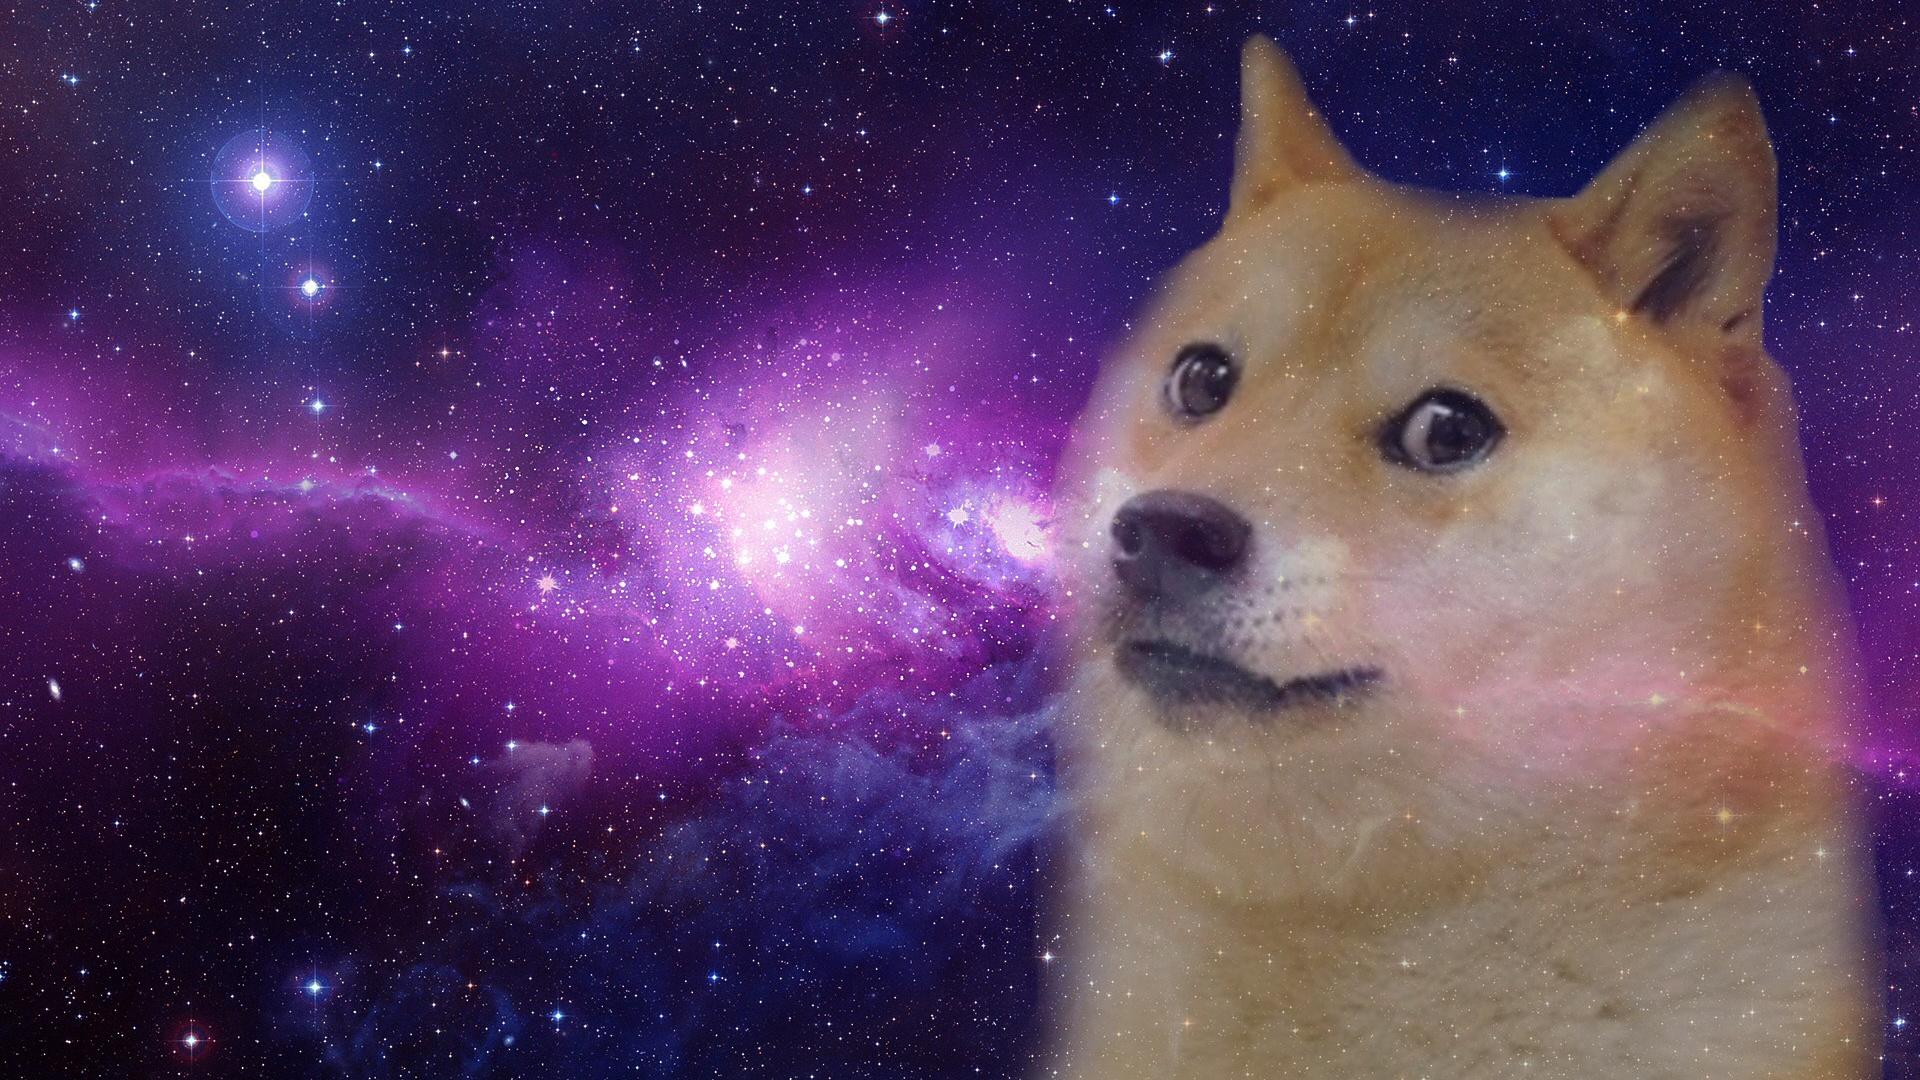 Doge Meme computer wallpaper